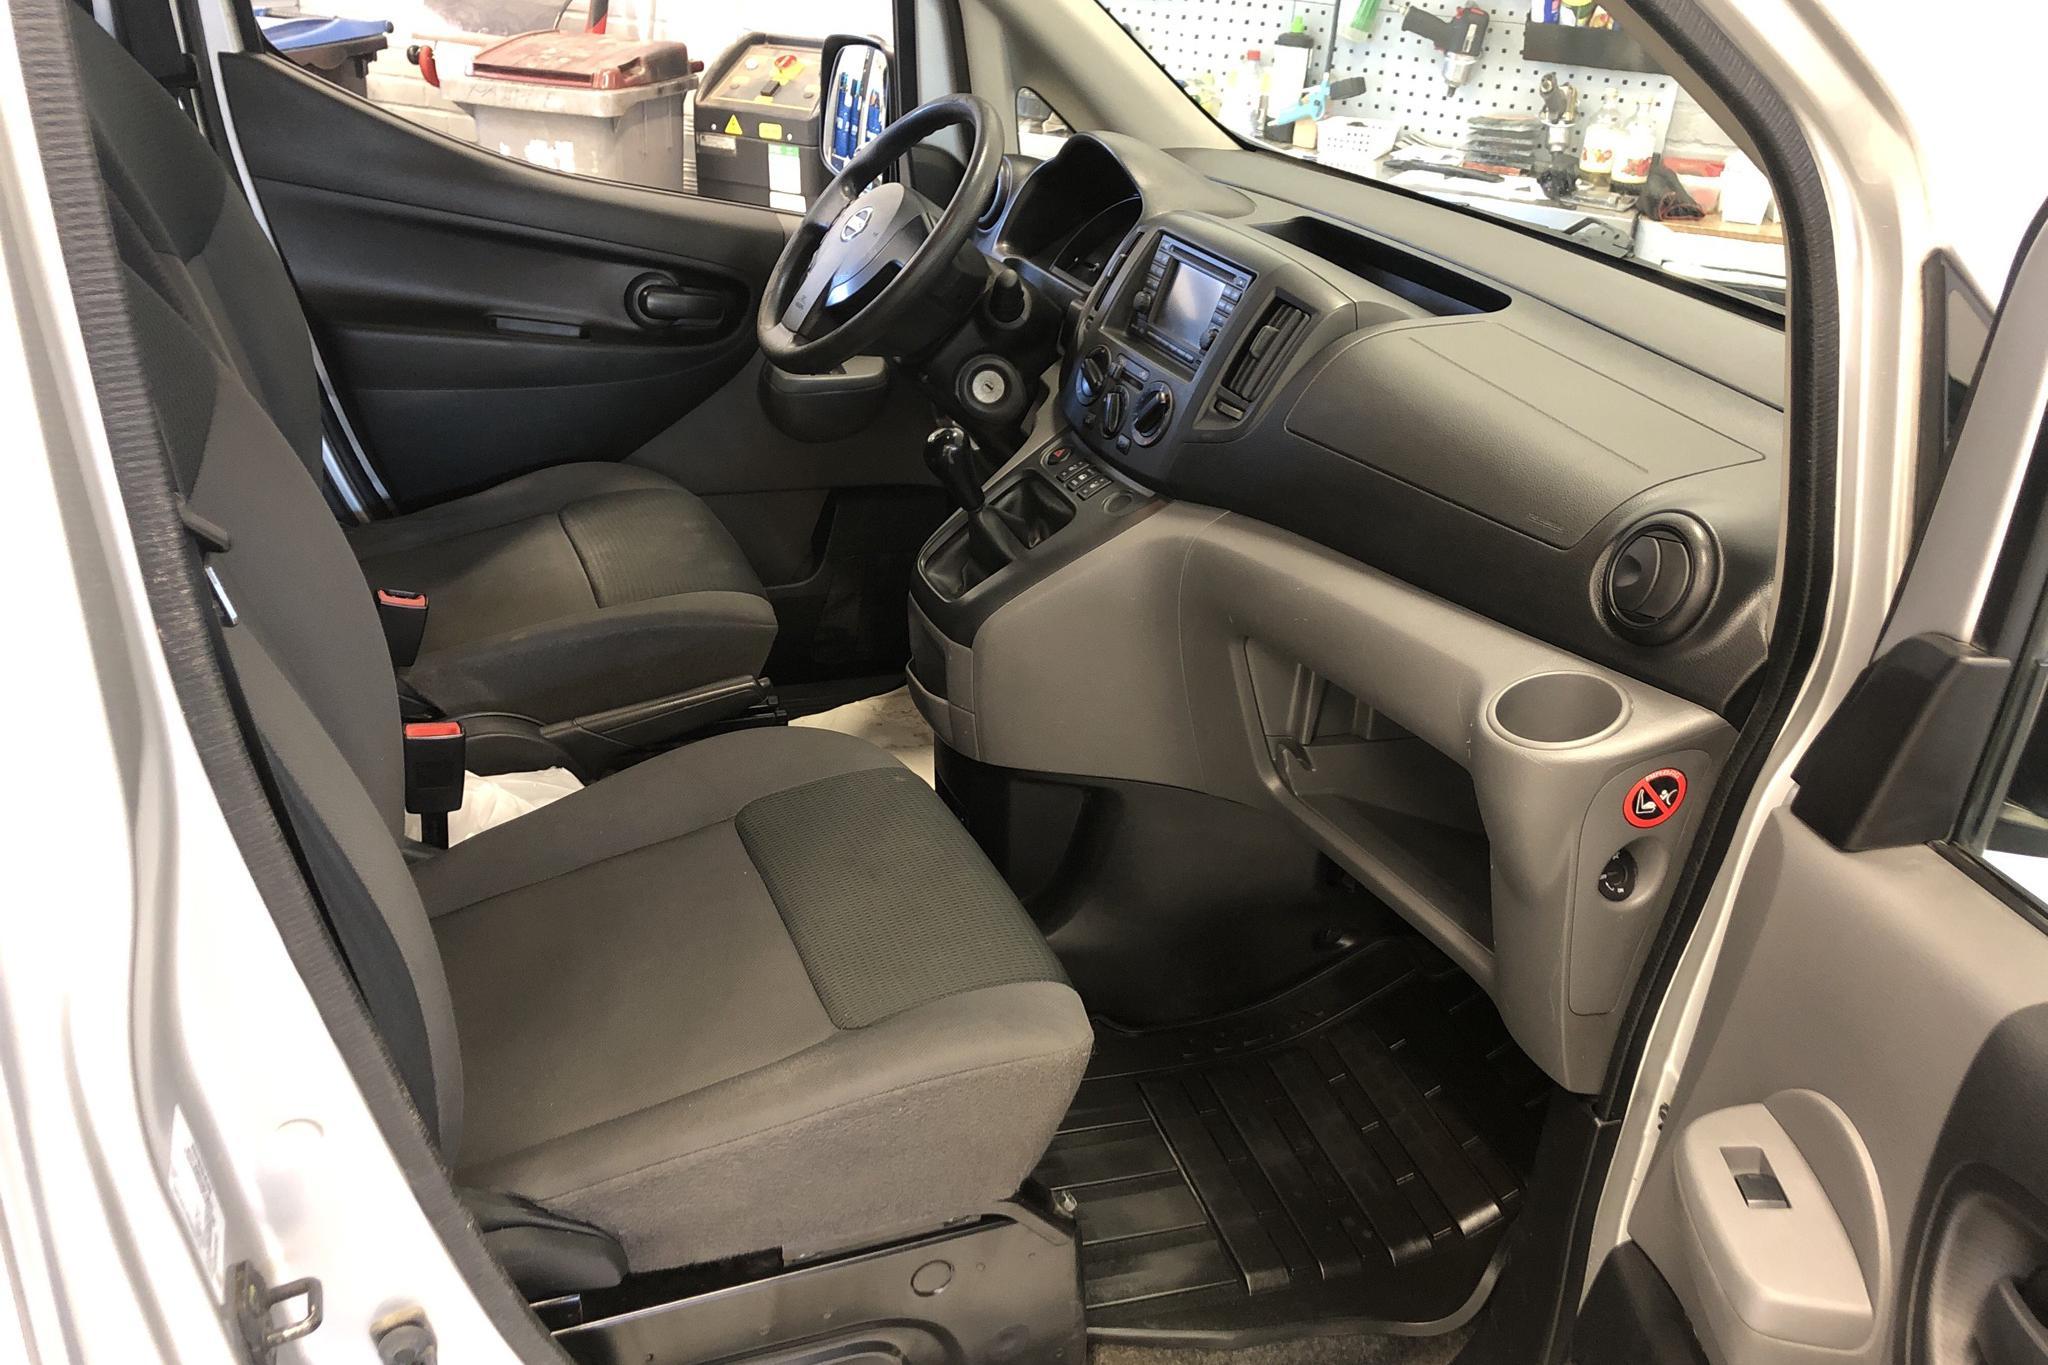 Nissan NV200 1.5 dCi Skåp (90hk) - 0 mil - Manuell - silver - 2014